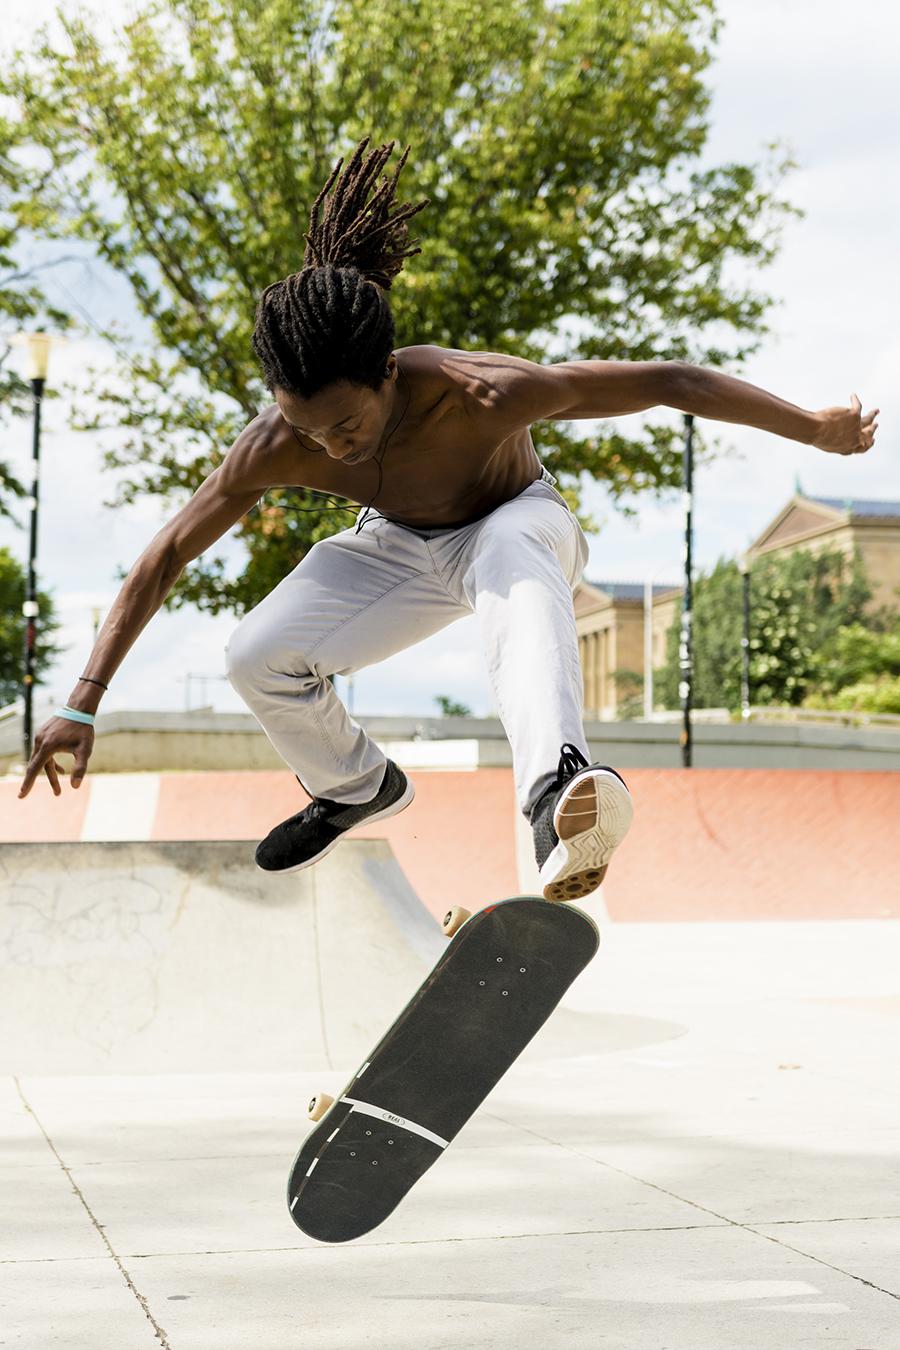 Michael_Heath_Skatepark_Color-Tony_Ward_Studio_Upenn_photo_fashion_acrobatics